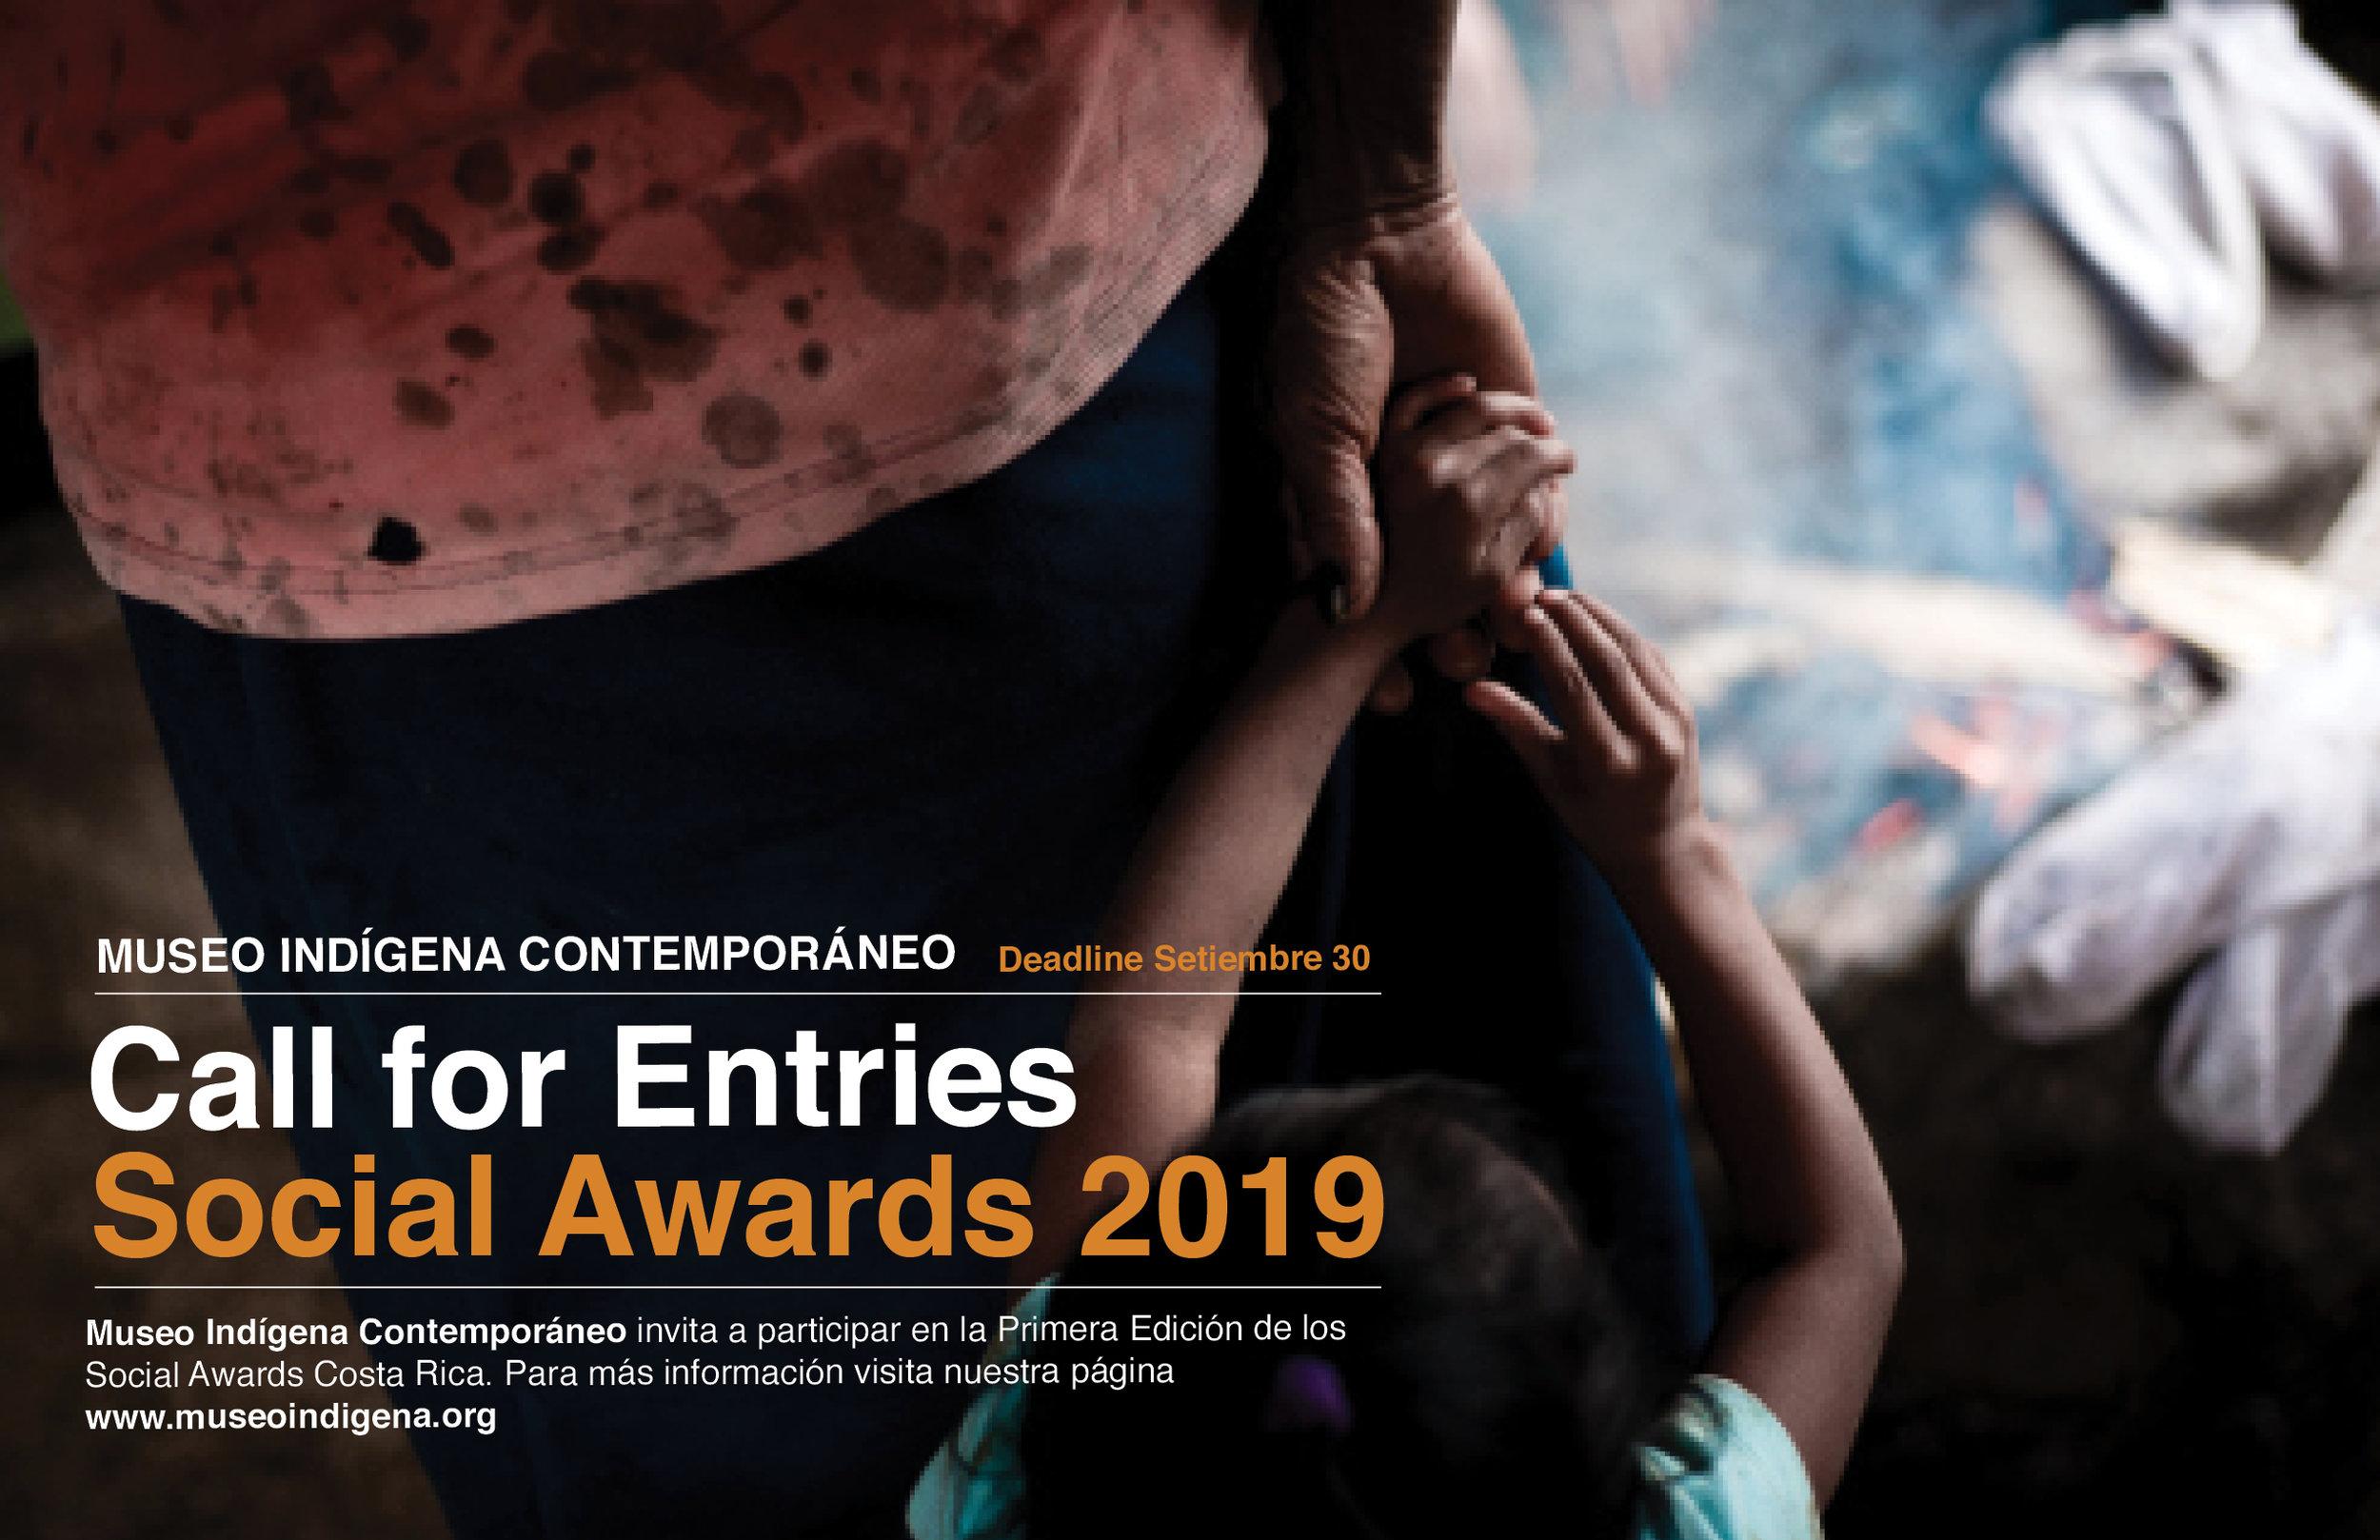 MIC_Call for entries social awards 20192.jpg